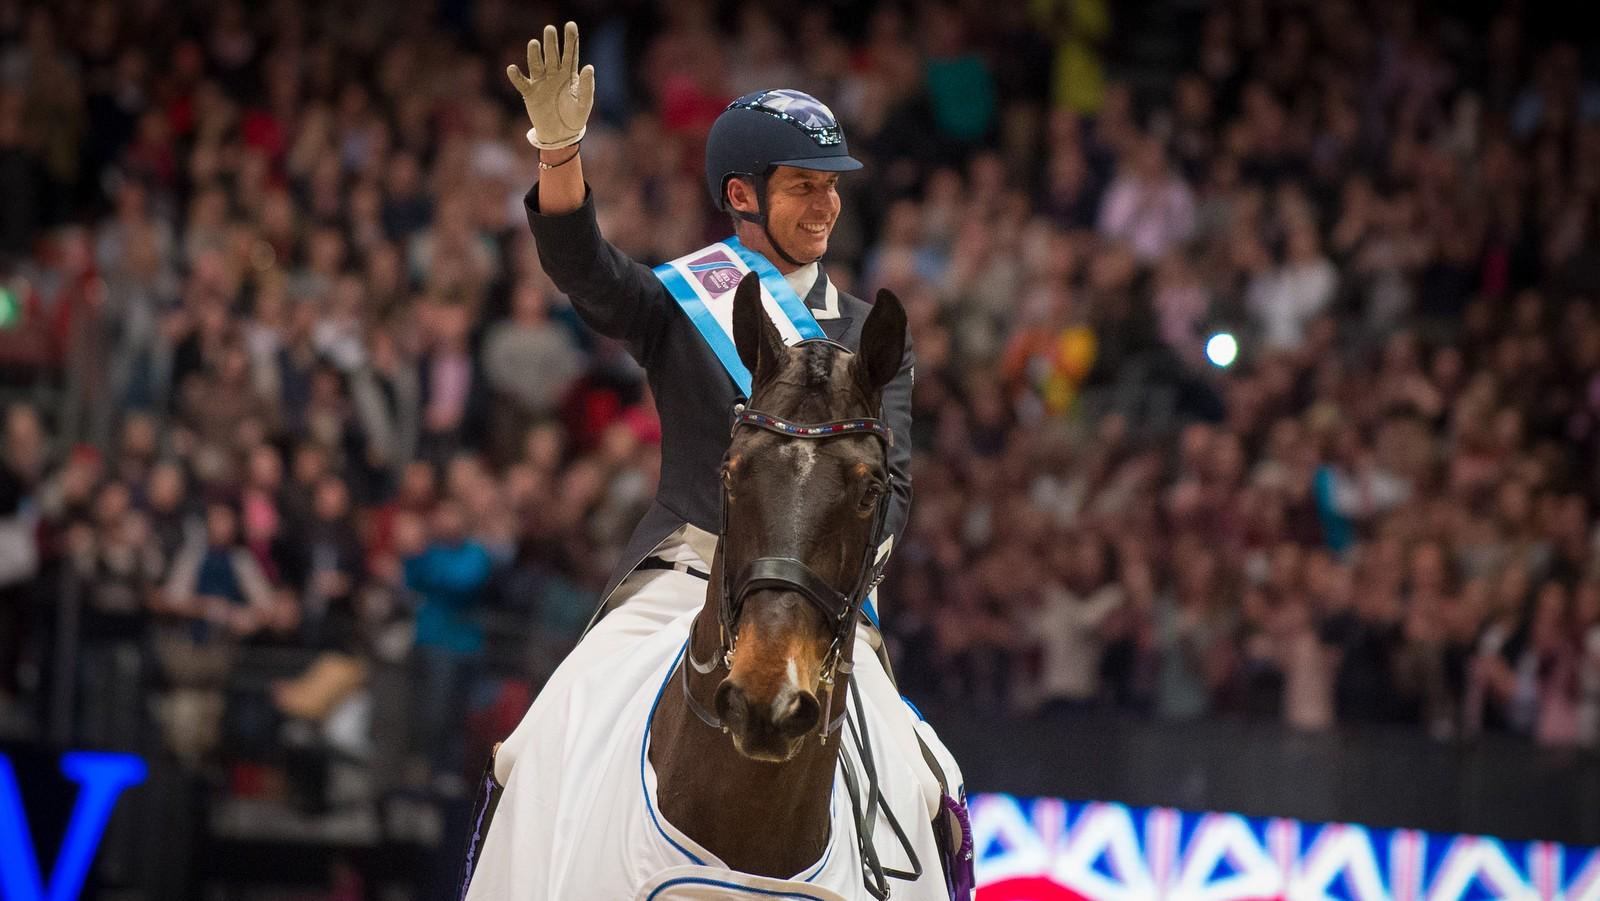 Carl Hester wint wereldbeker Londen, Hans Peter Minderhoud tweede